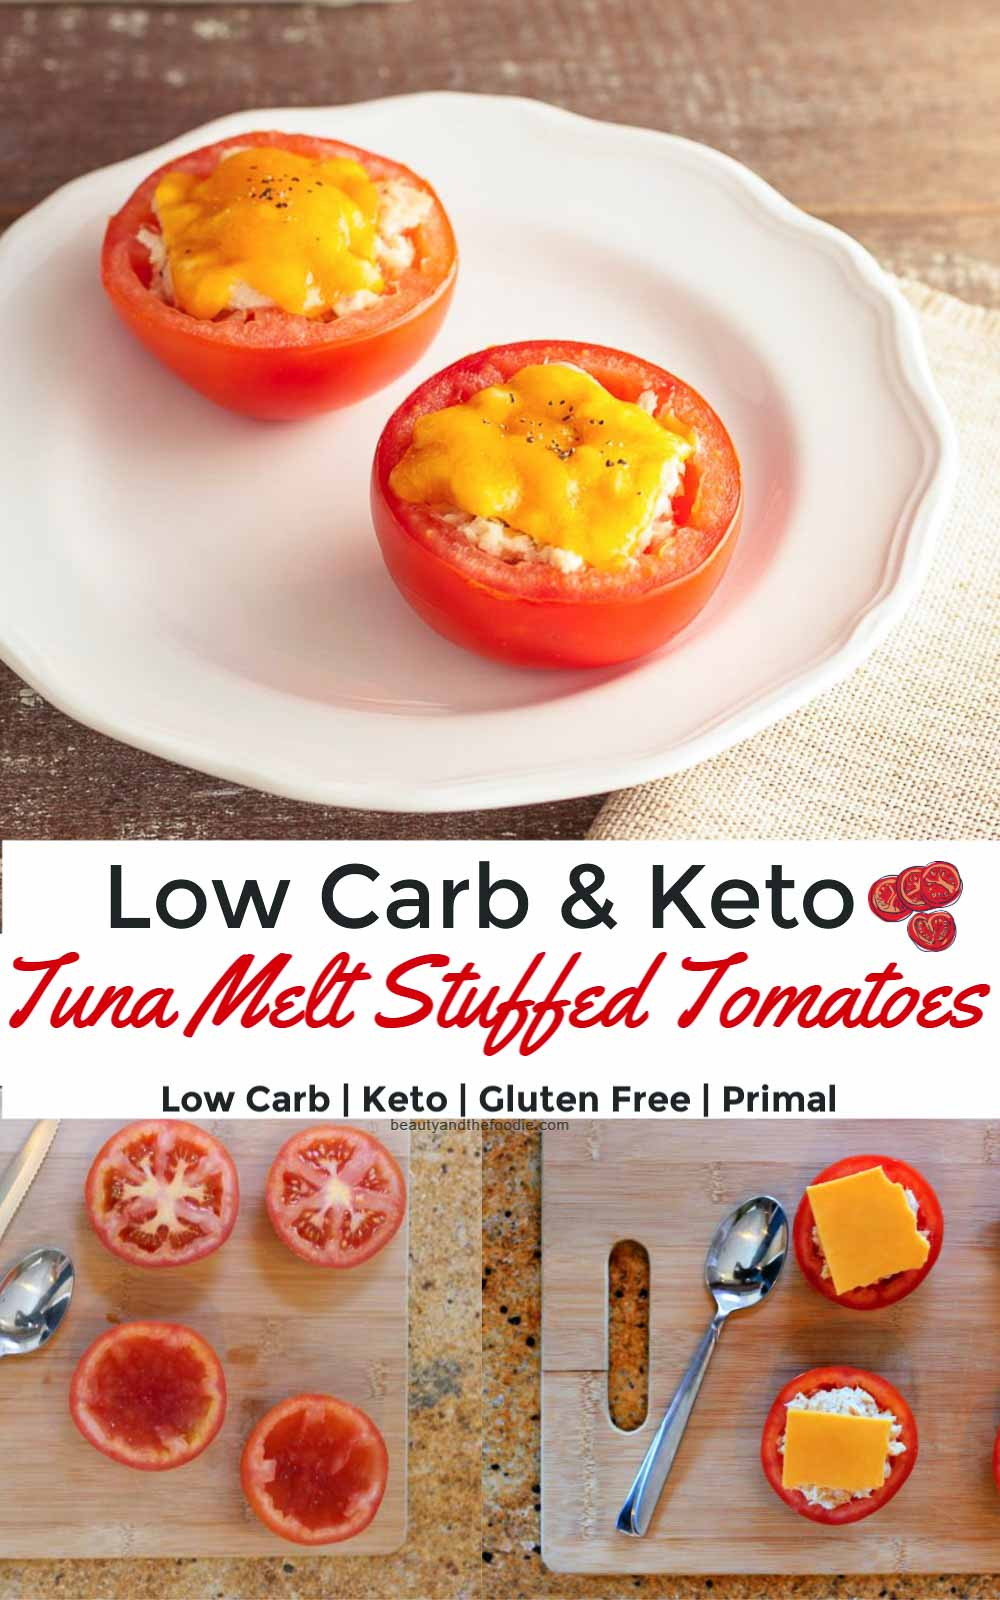 Low Carb Tuna melt stuffed tomatoes